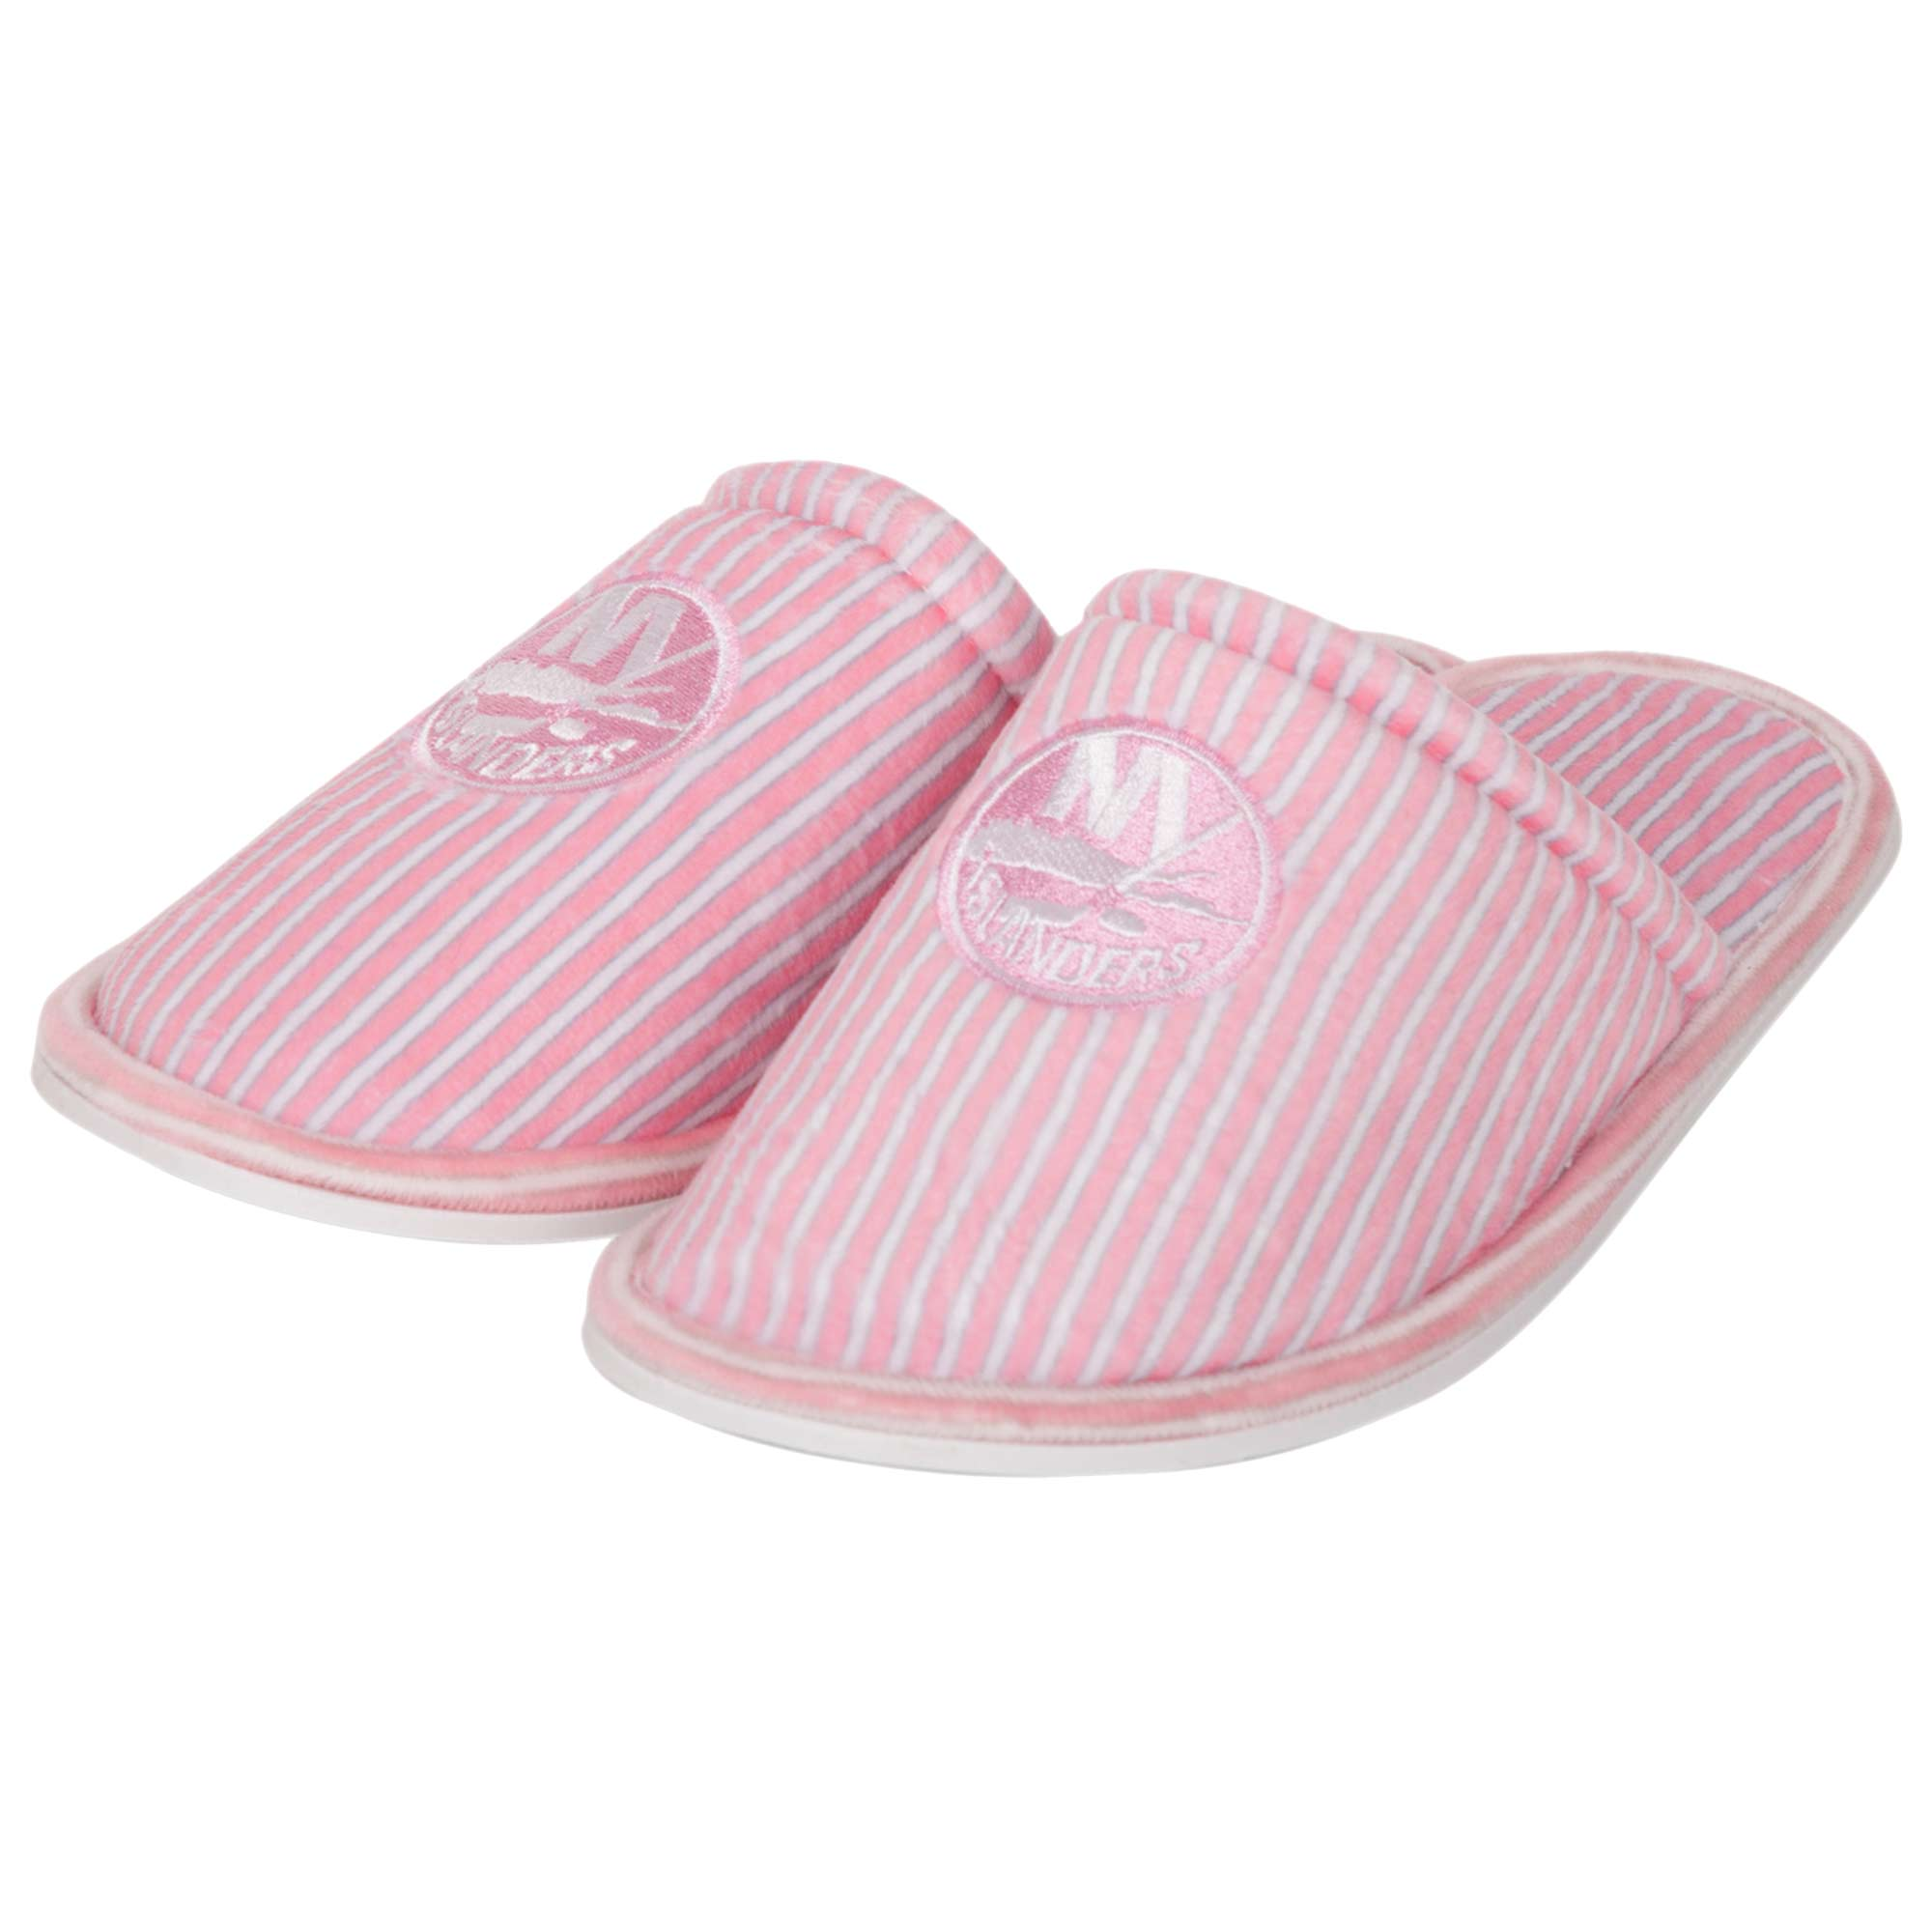 New York Islanders Women's Slide Slipper - Pink